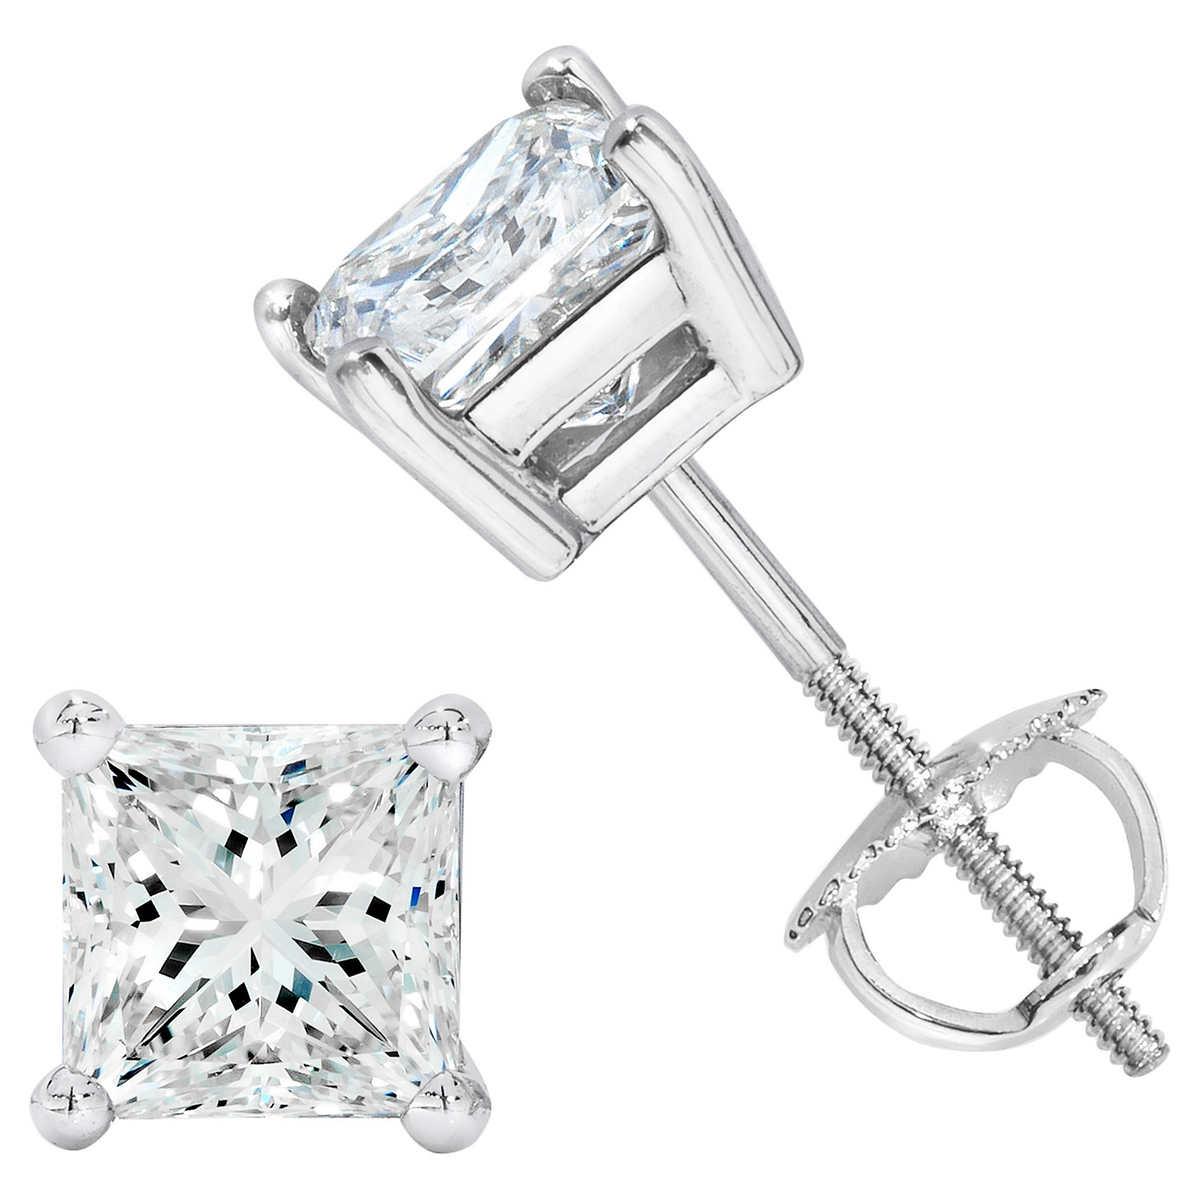 Princess Cut 2 00 ctw VS2 Clarity I Color Diamond Platinum